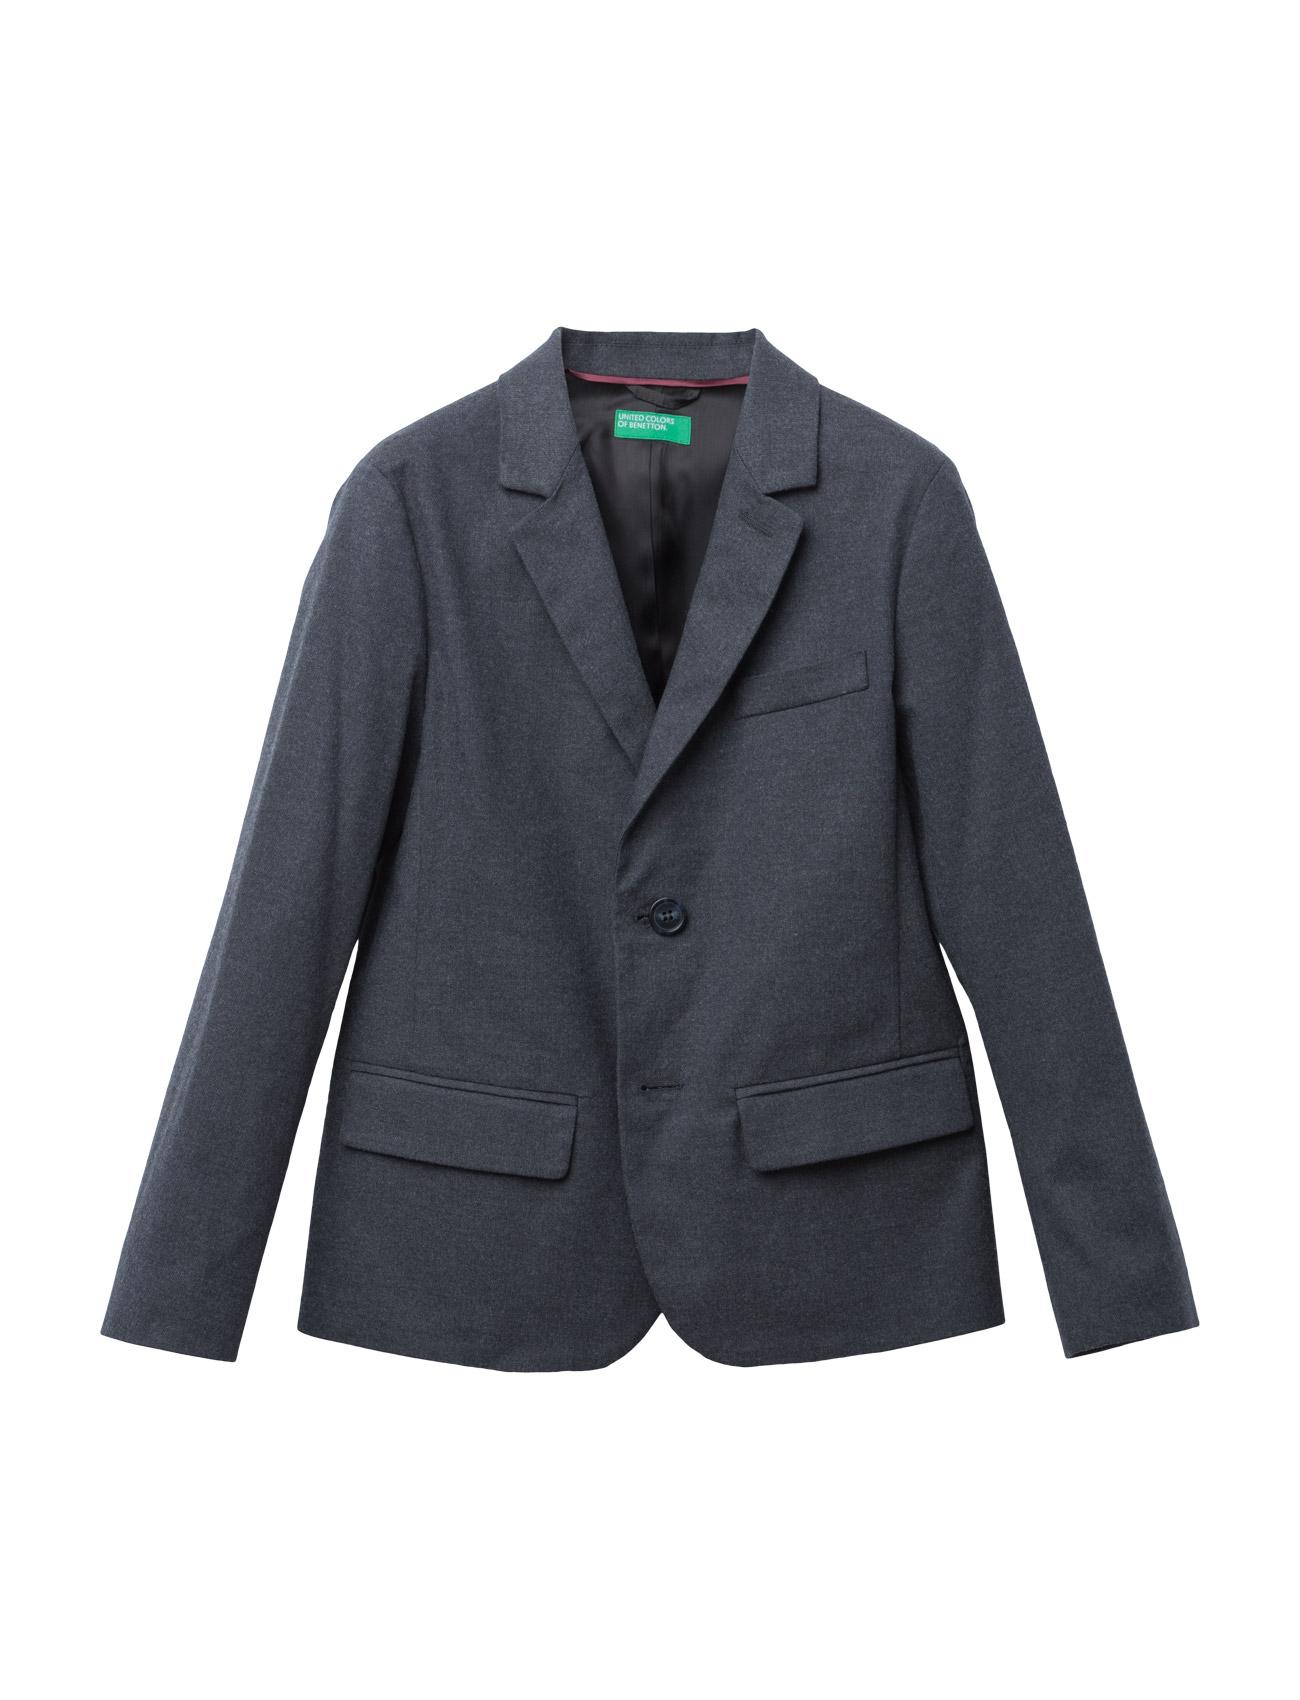 Jacket United Colors of Benetton Jakker & Frakker til Børn i Grå